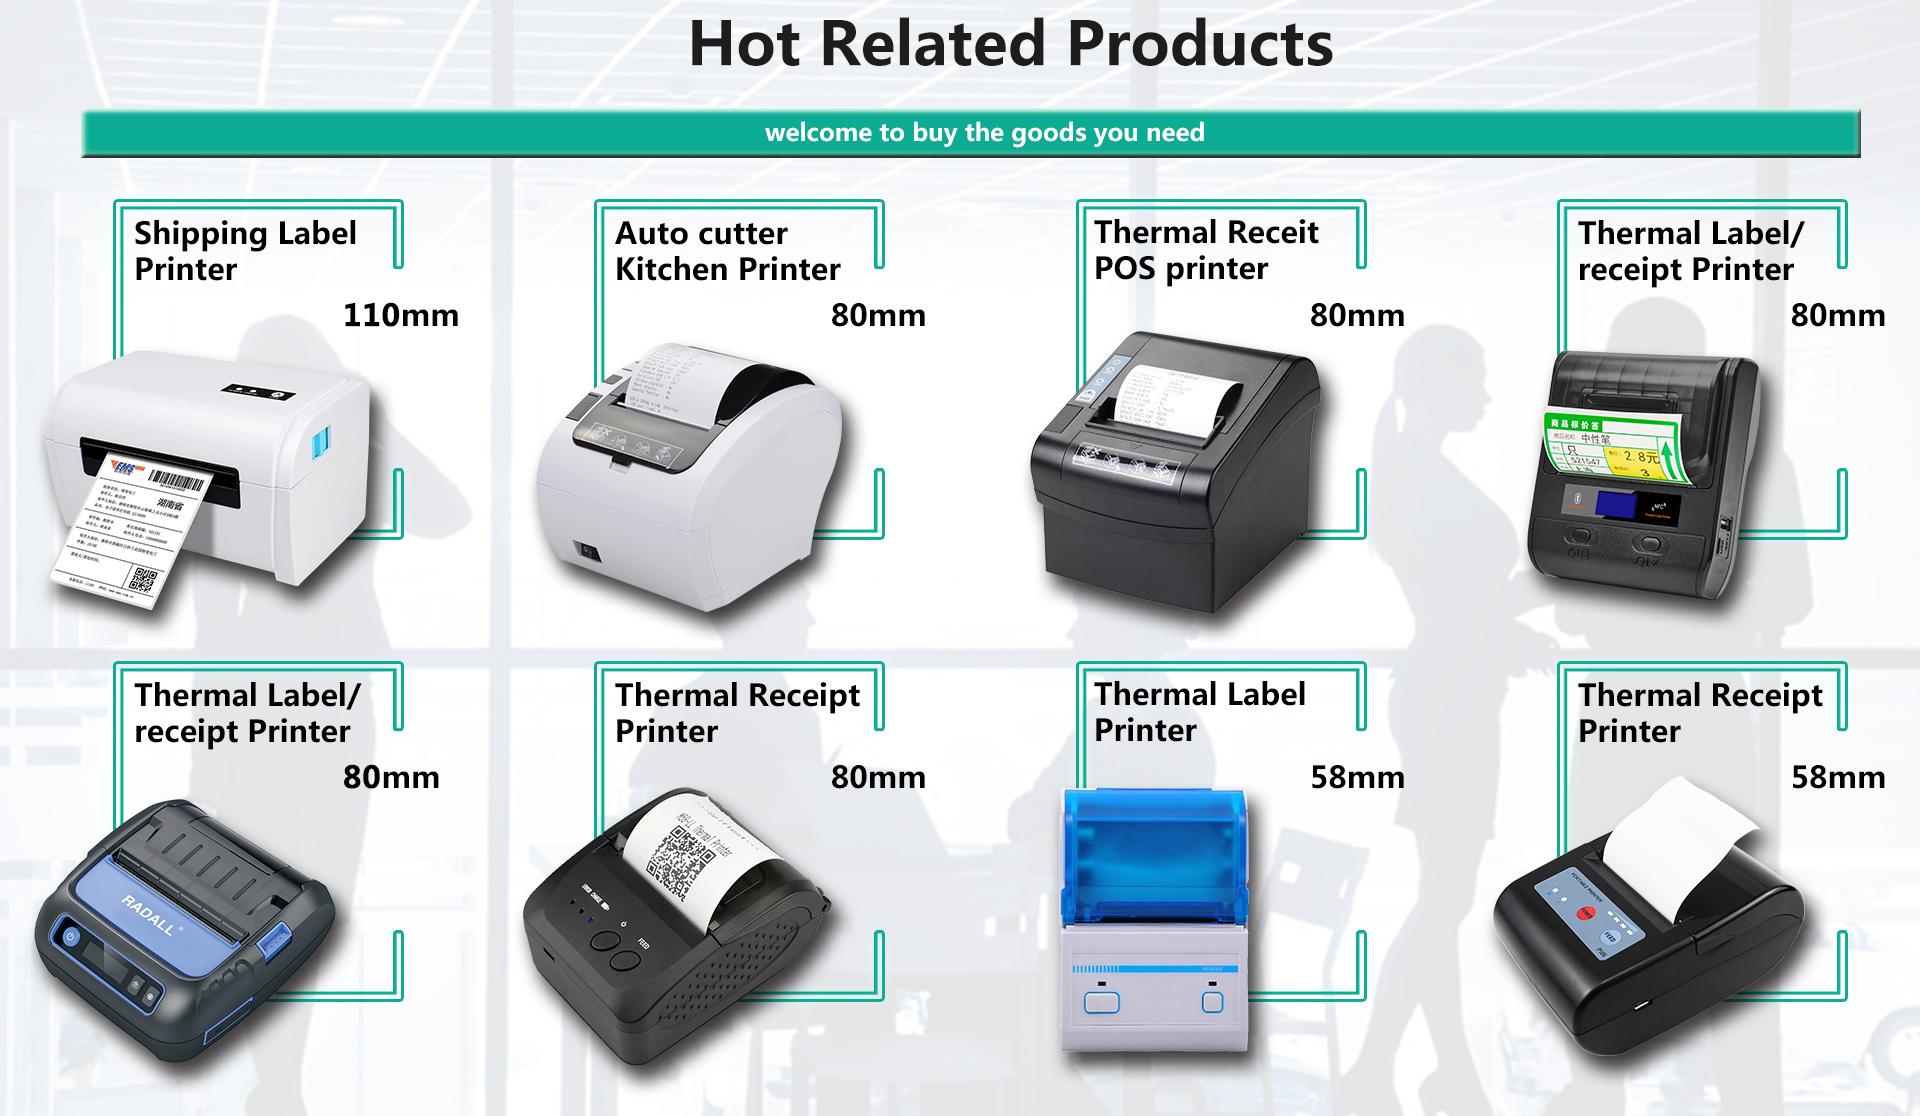 thermal printer catogue.jpg